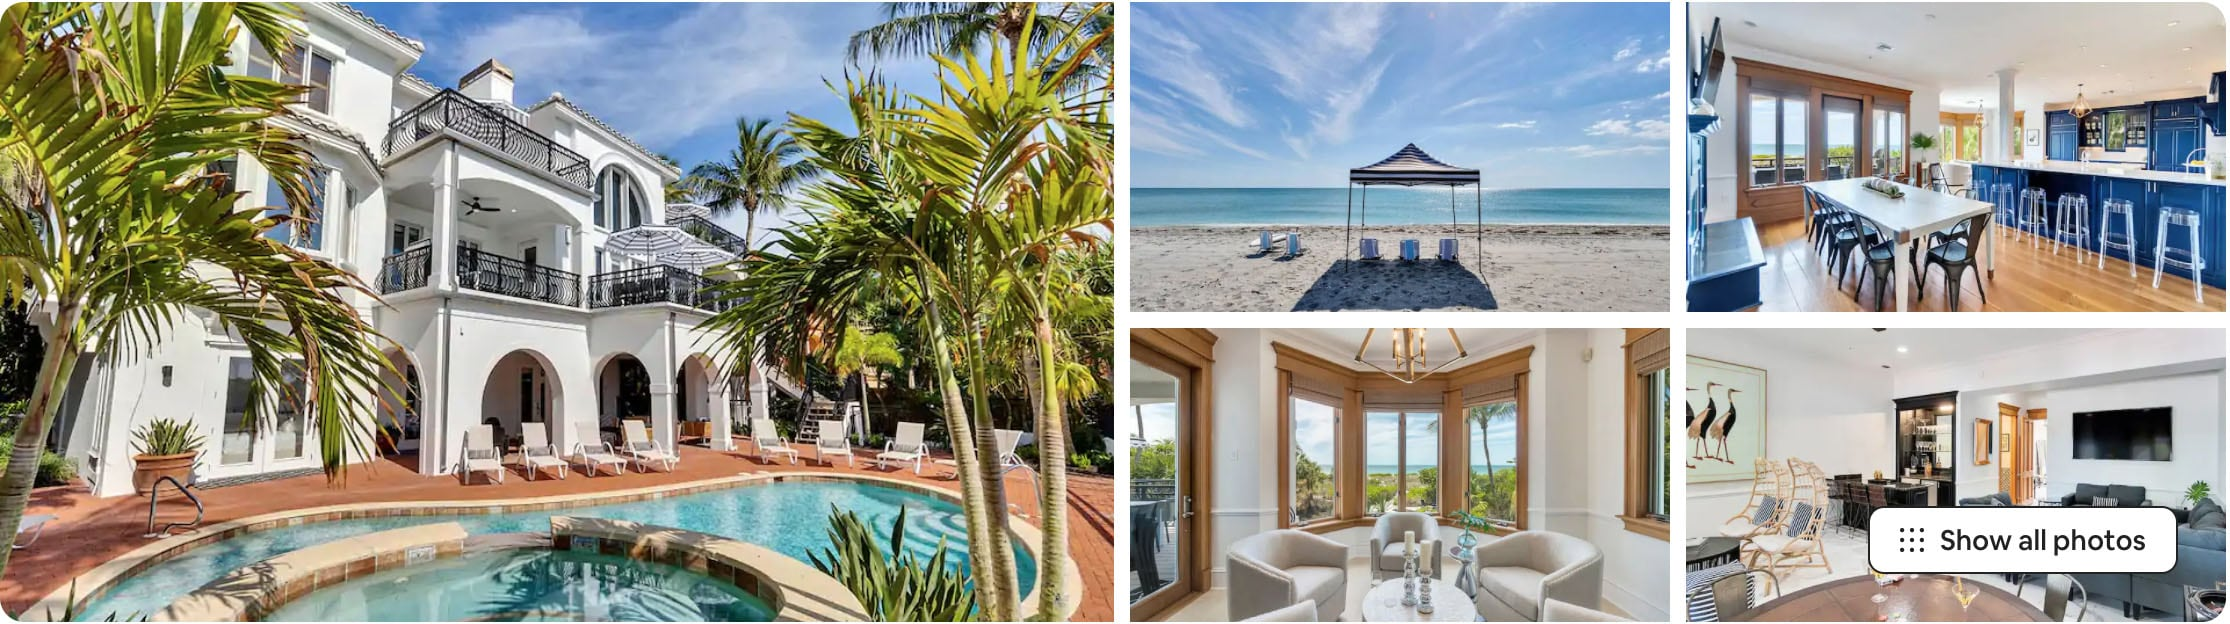 Captiva Island airbnb